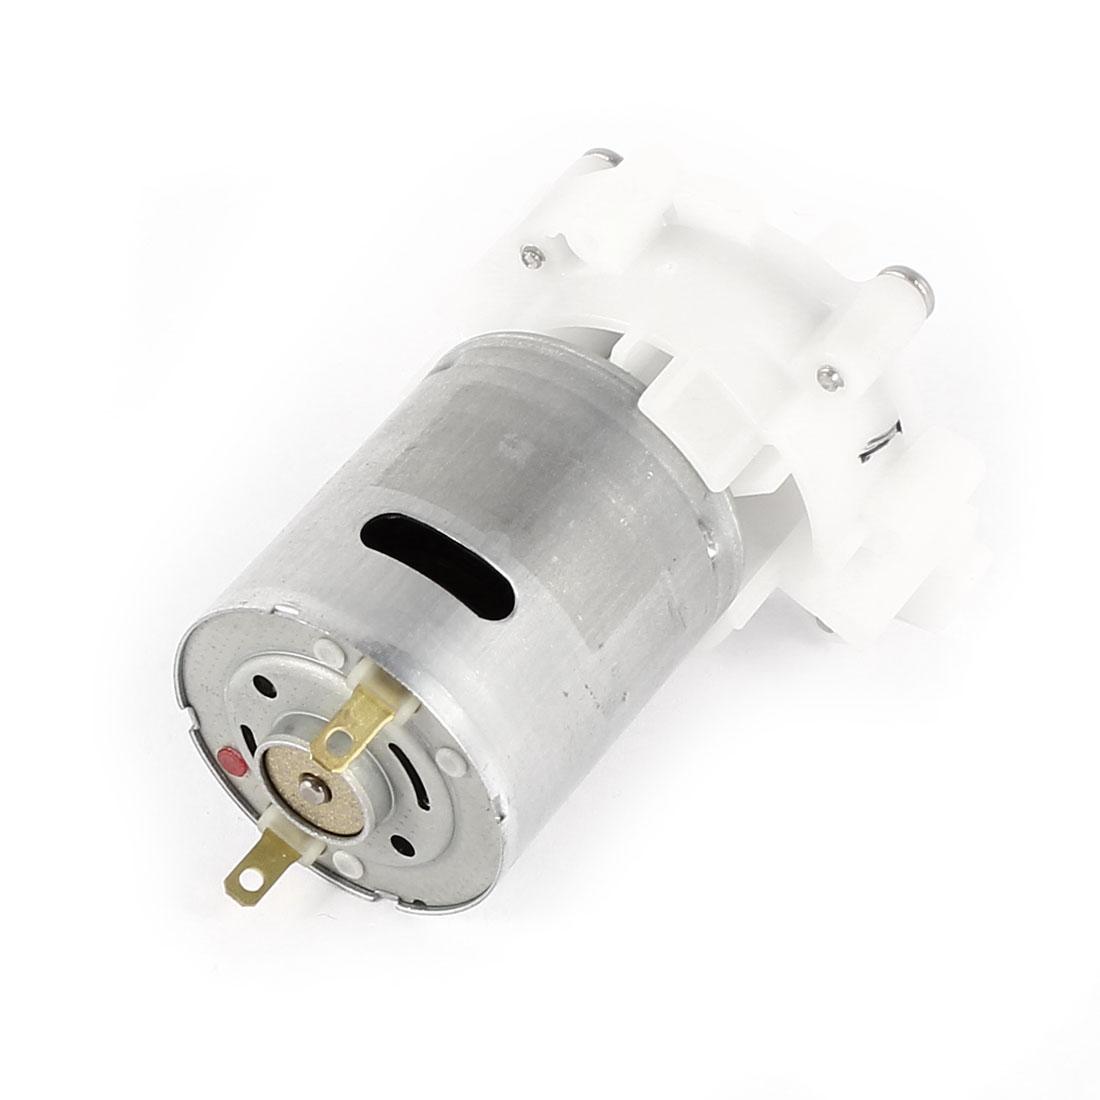 RS-360SH DC 5V 1.2L/min 2 Pin Micropump Water Pump Motor for Aquarium